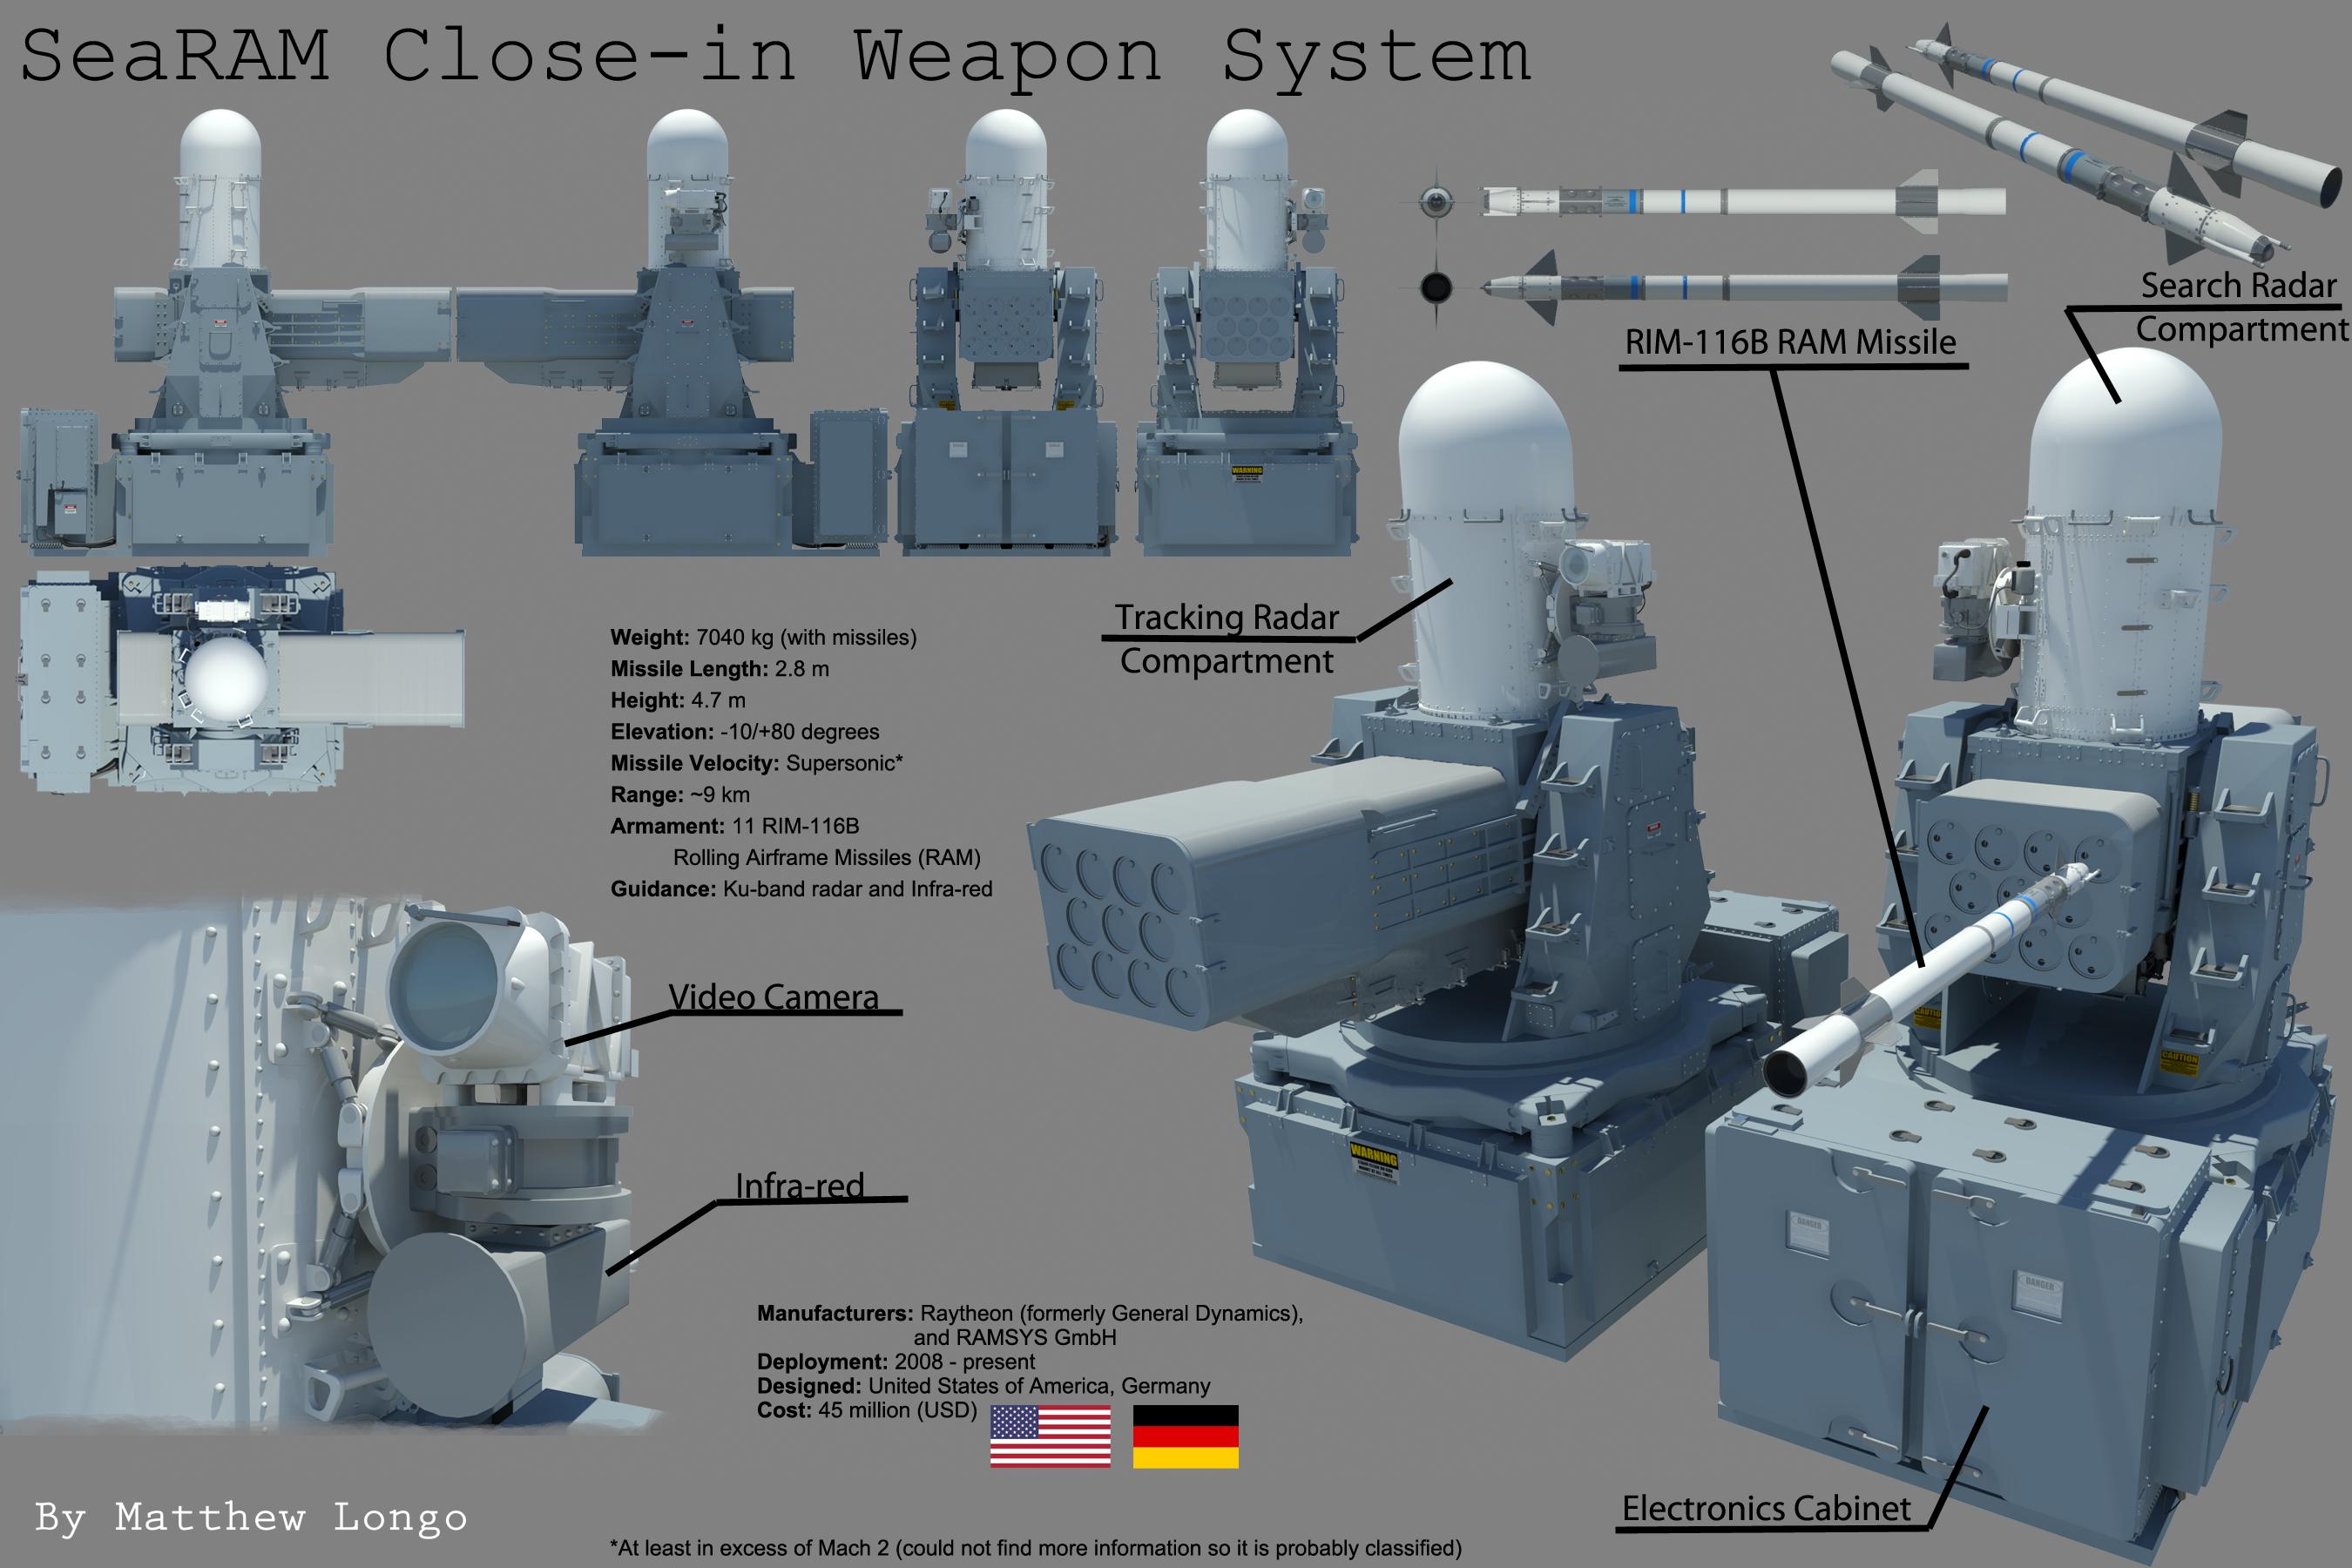 منظومة SeaRAM تقوم بصد صاروخ مضاد لسفن بنجاح Searam_rim_116b_rolling_airframe_missile_ciws_by_eumenesofcardia-d5z5k66